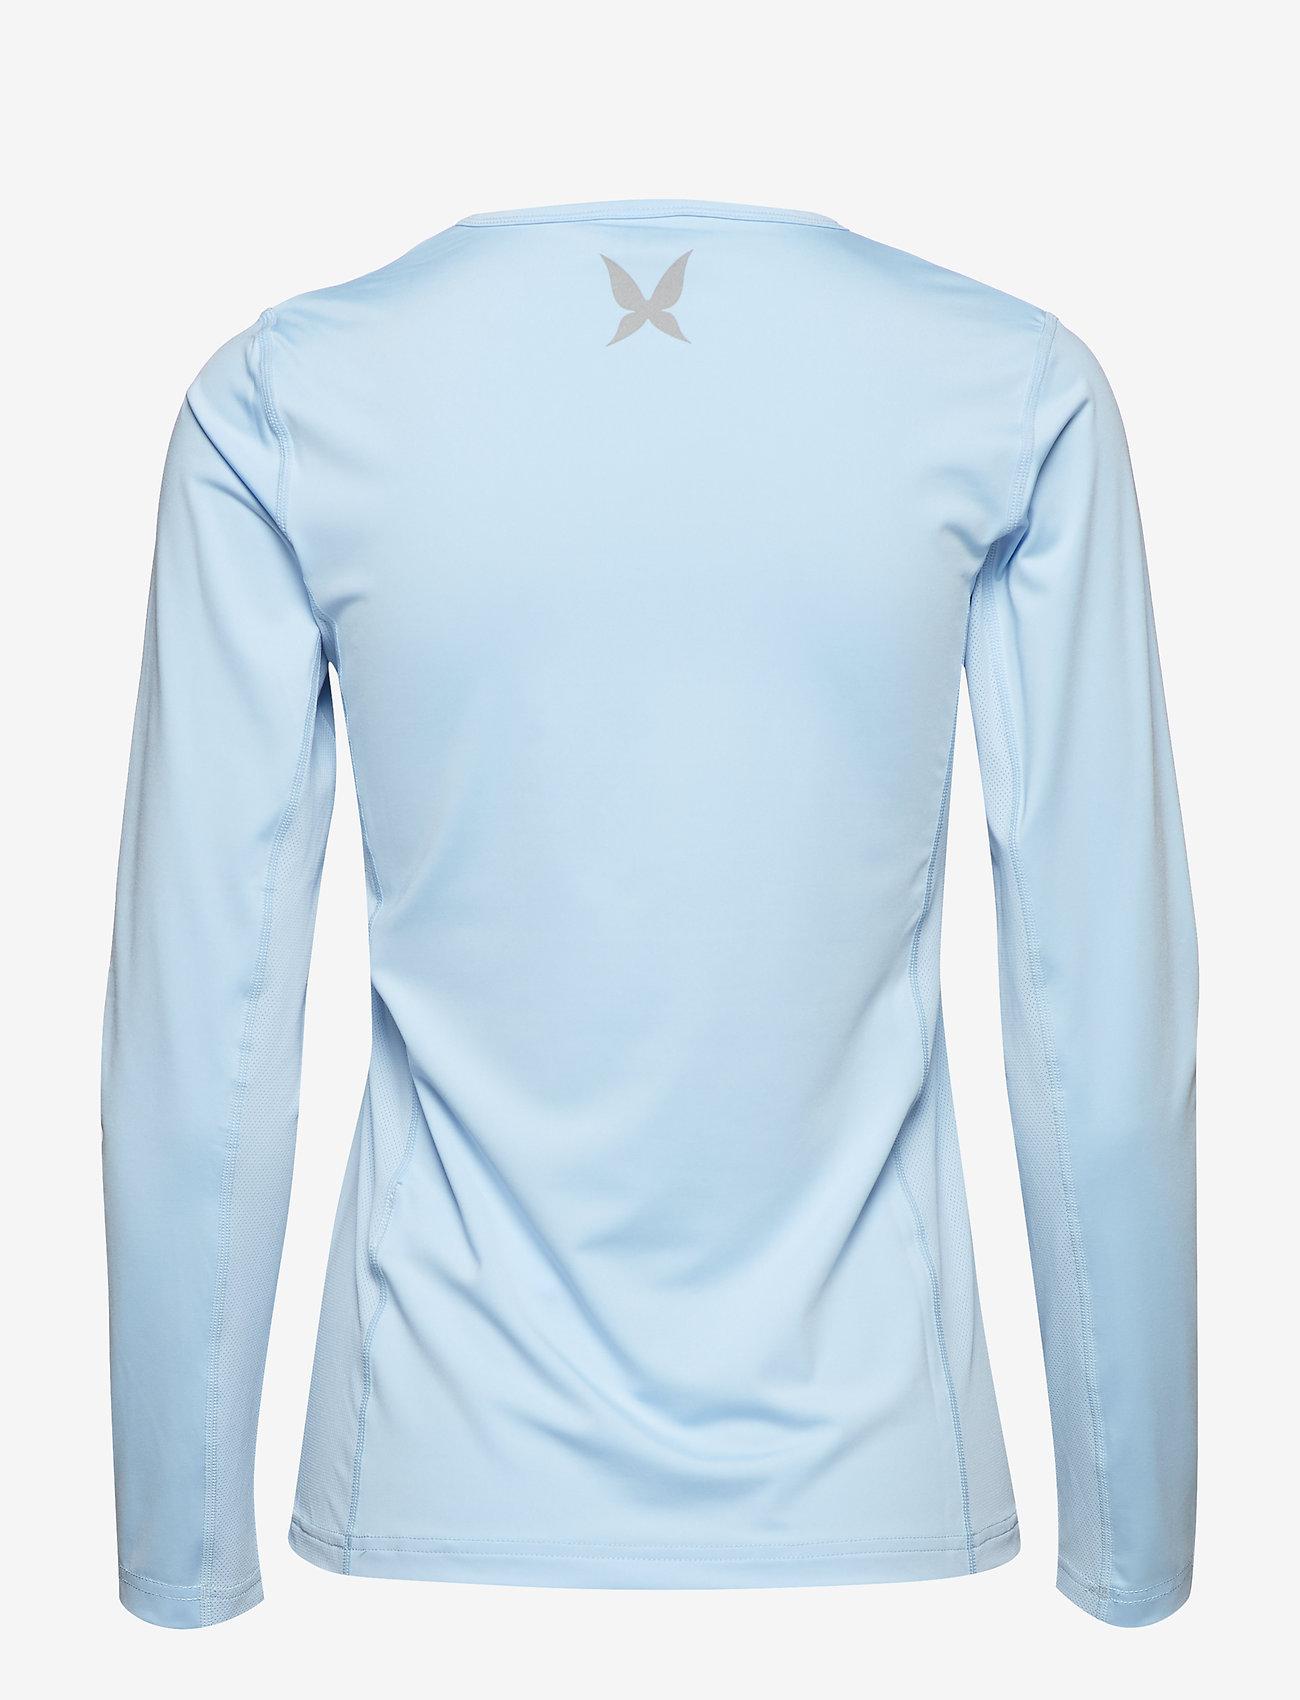 Kari Traa - NORA LS - logo t-shirts - cloud - 1